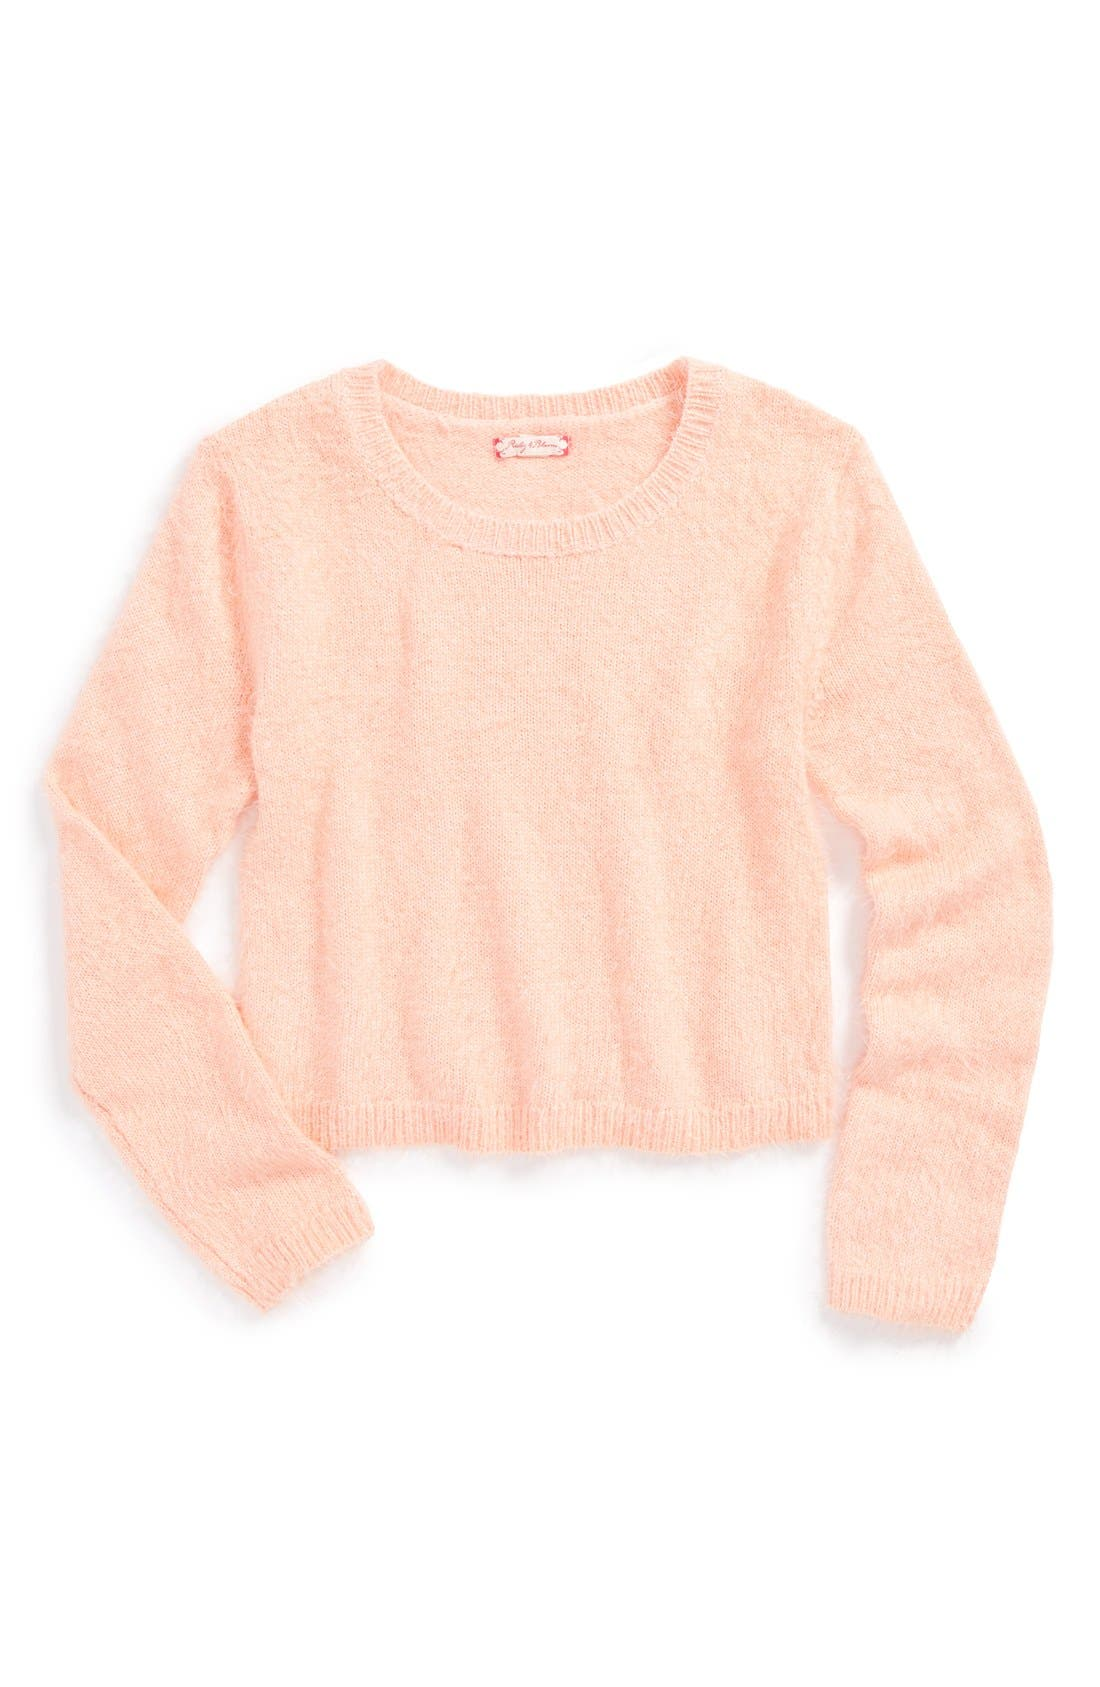 Main Image - Ruby & Bloom 'Jetee' Sweater (Little Girls & Big Girls)